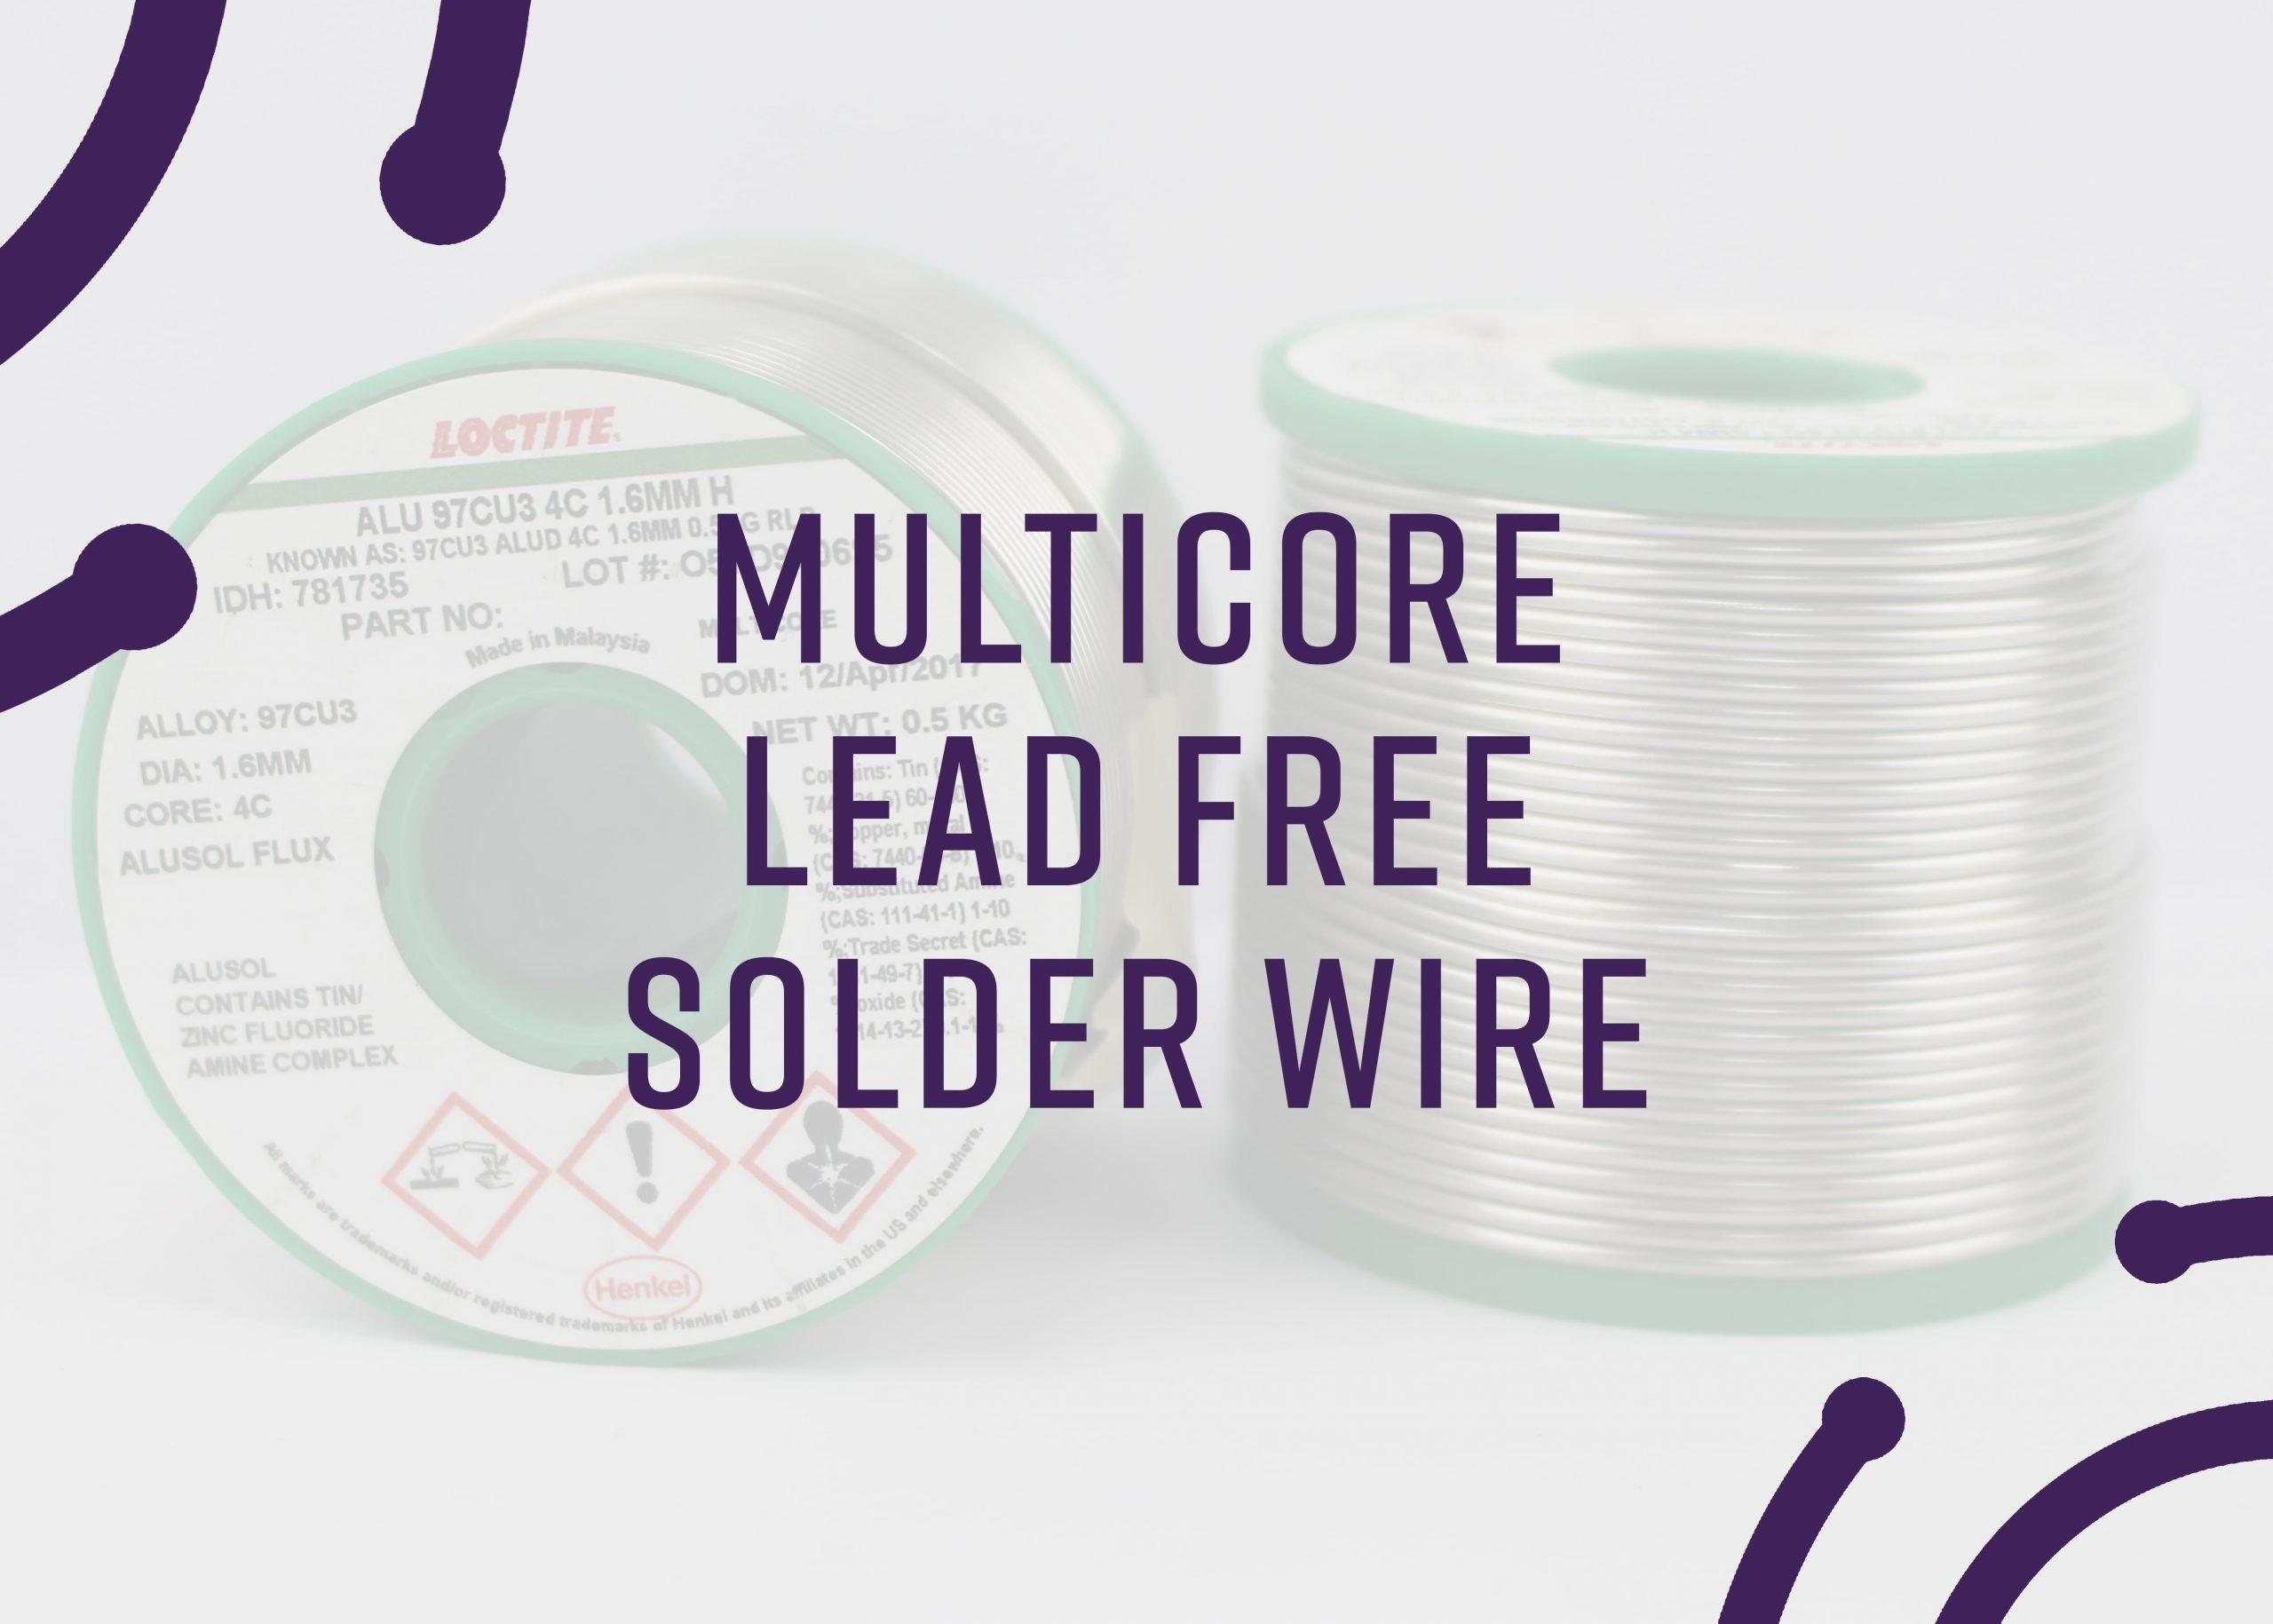 multicore lead free solder wire, multicore solder, lead free solder